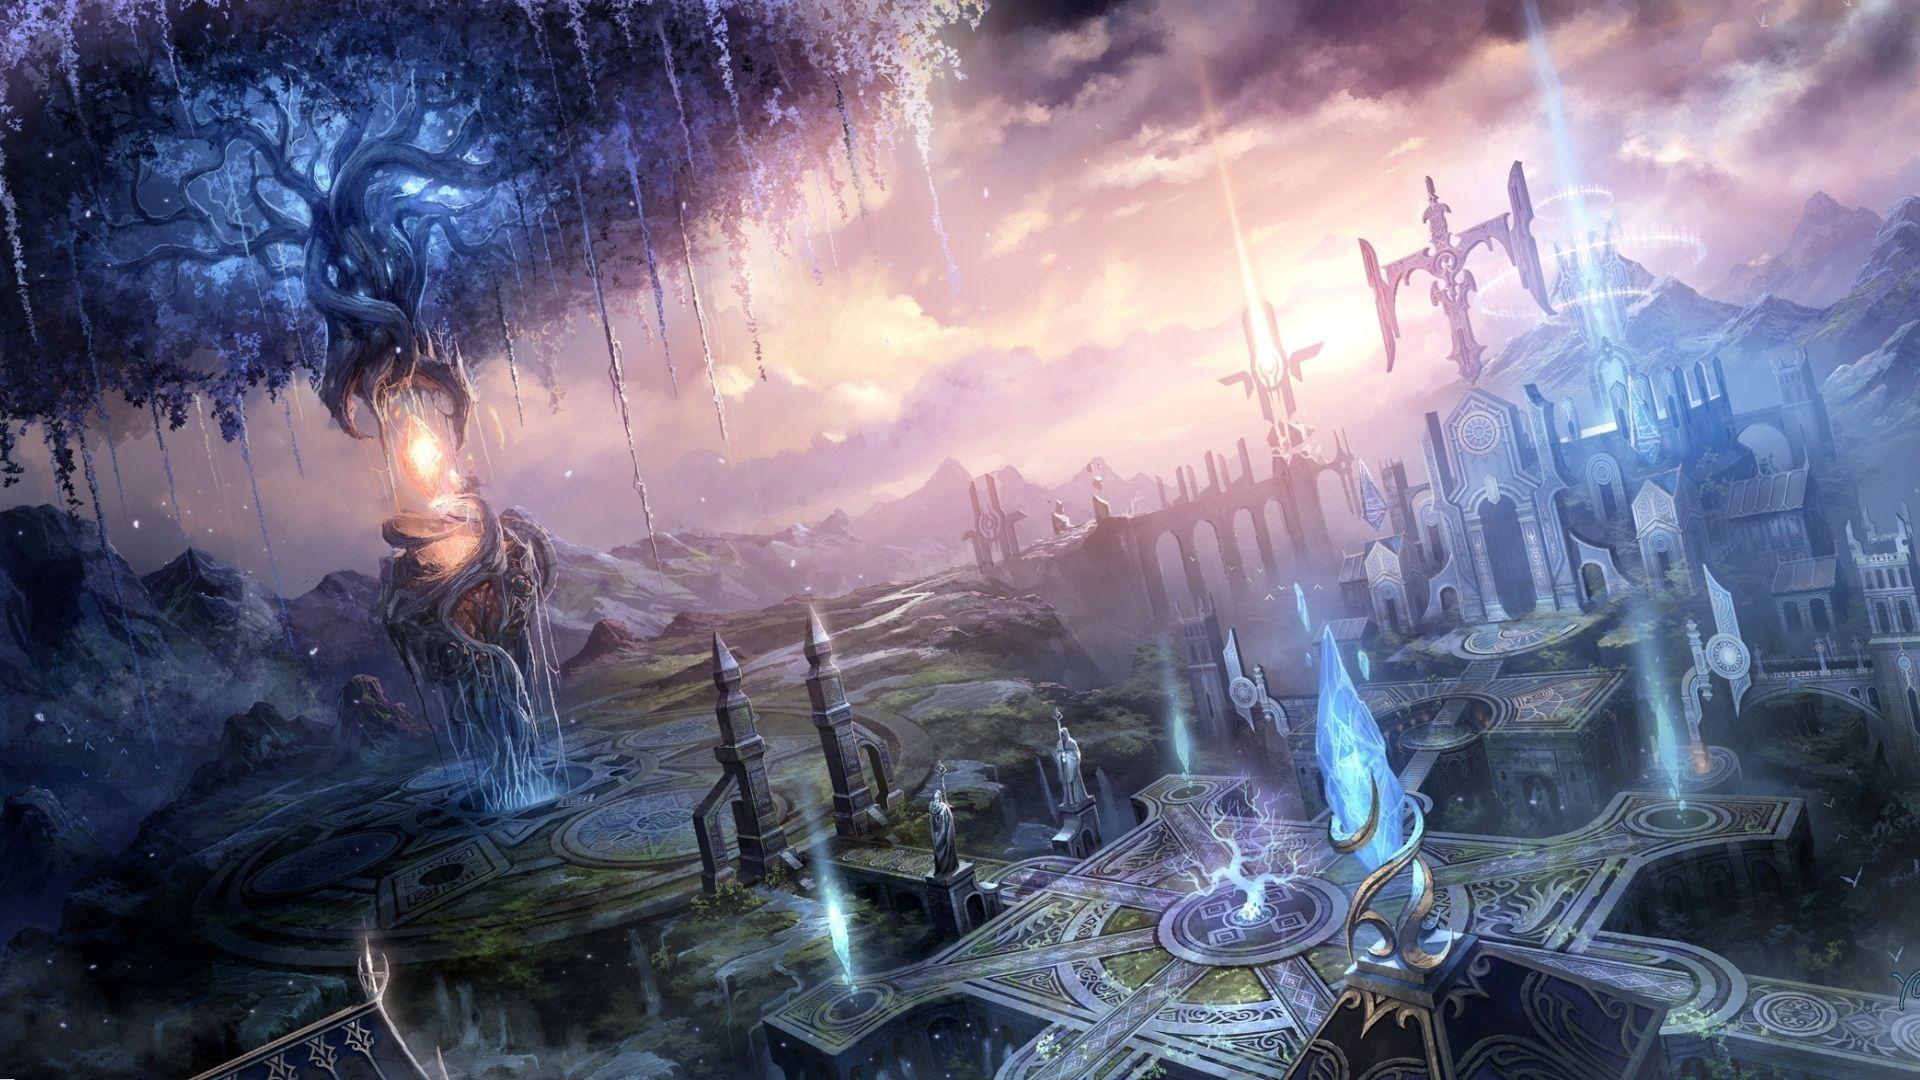 magic castle fantasy world - photo #36